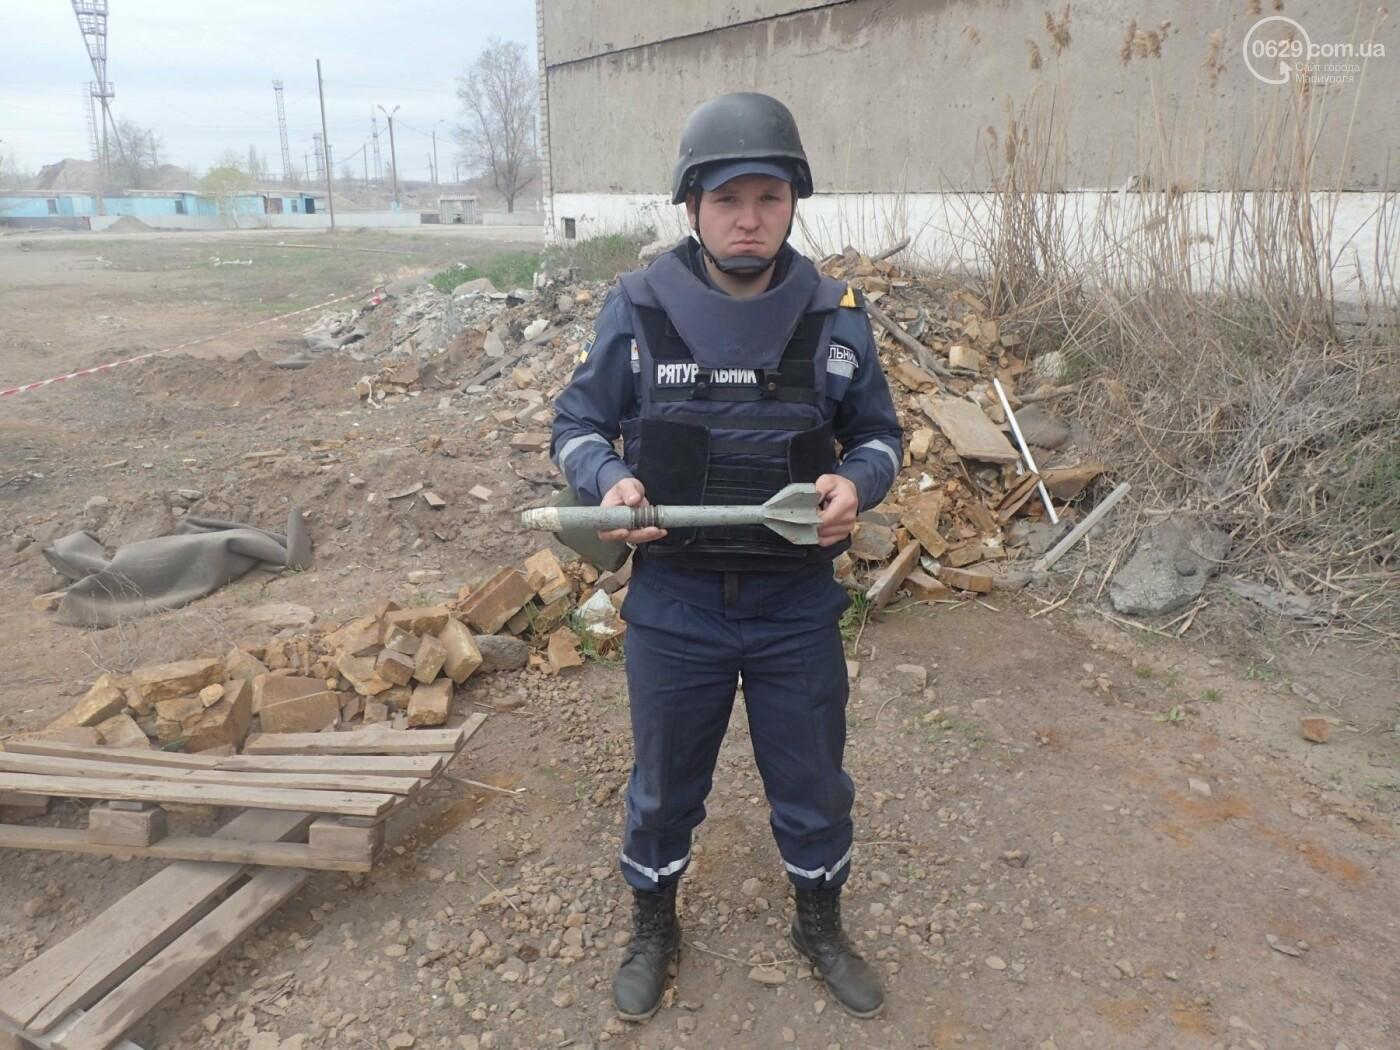 В Мариуполе на территории ММКИ нашли бронебойный снаряд (ДОПОЛНЕНО, ФОТО), фото-2